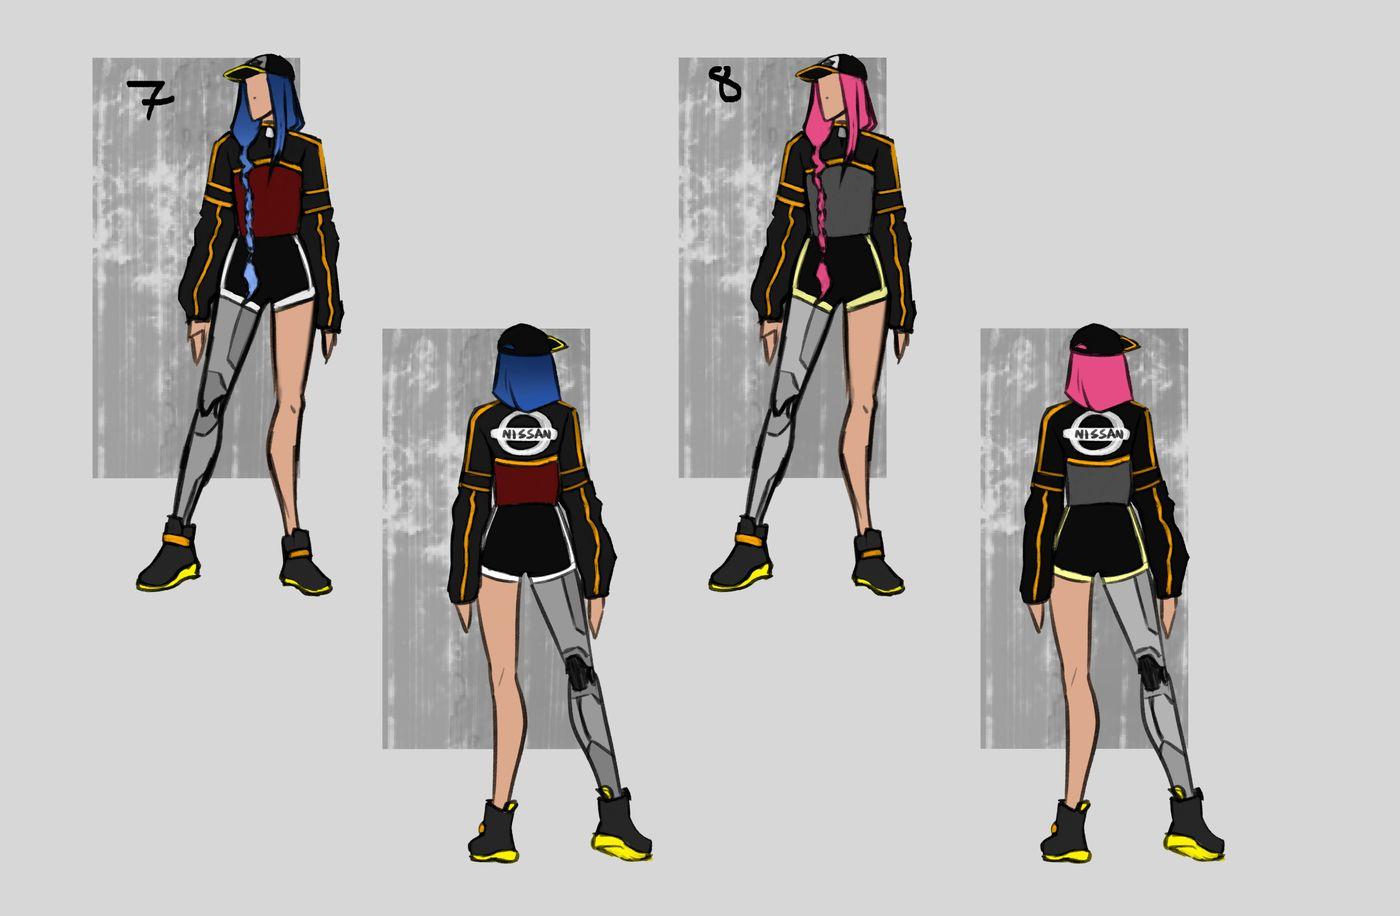 Steer Jasmine %20 Scme3420 Rookies %20 Character Design Colour Passes04 Jasminesteer